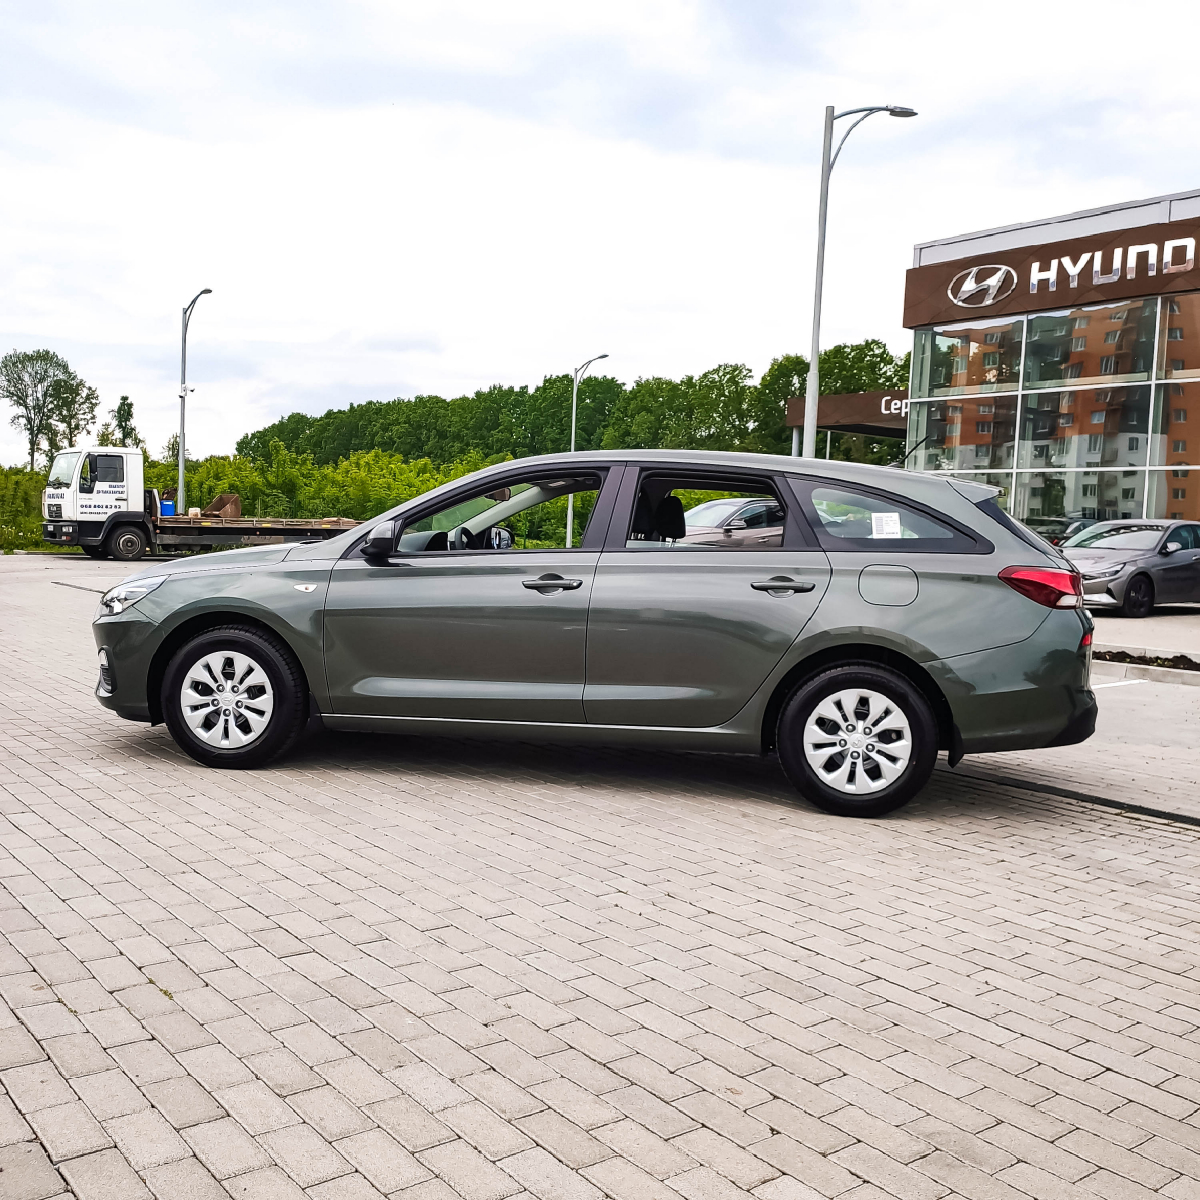 Спеціальна вигода на придбання Hyundai i30 WGN! | Хюндай Мотор Україна - фото 8